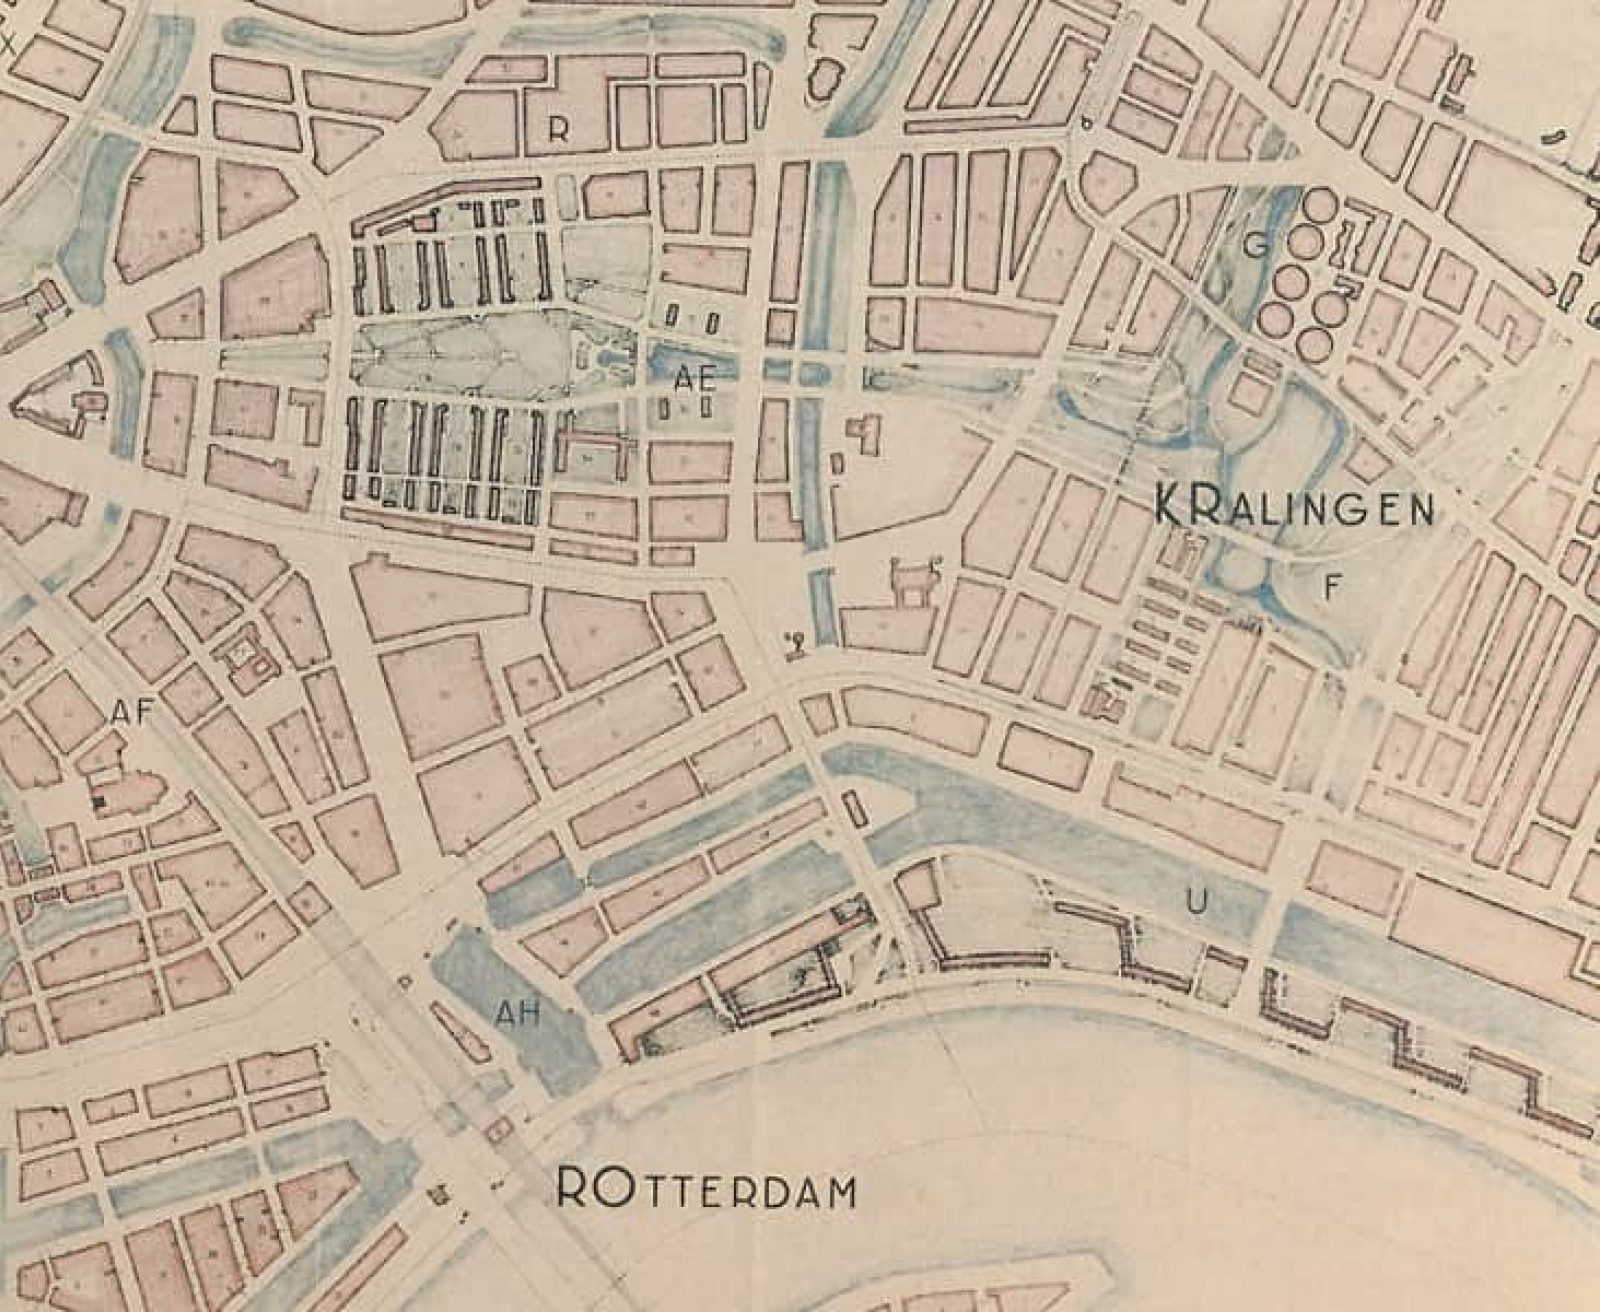 Stadsarchief Basisplan Kaart2